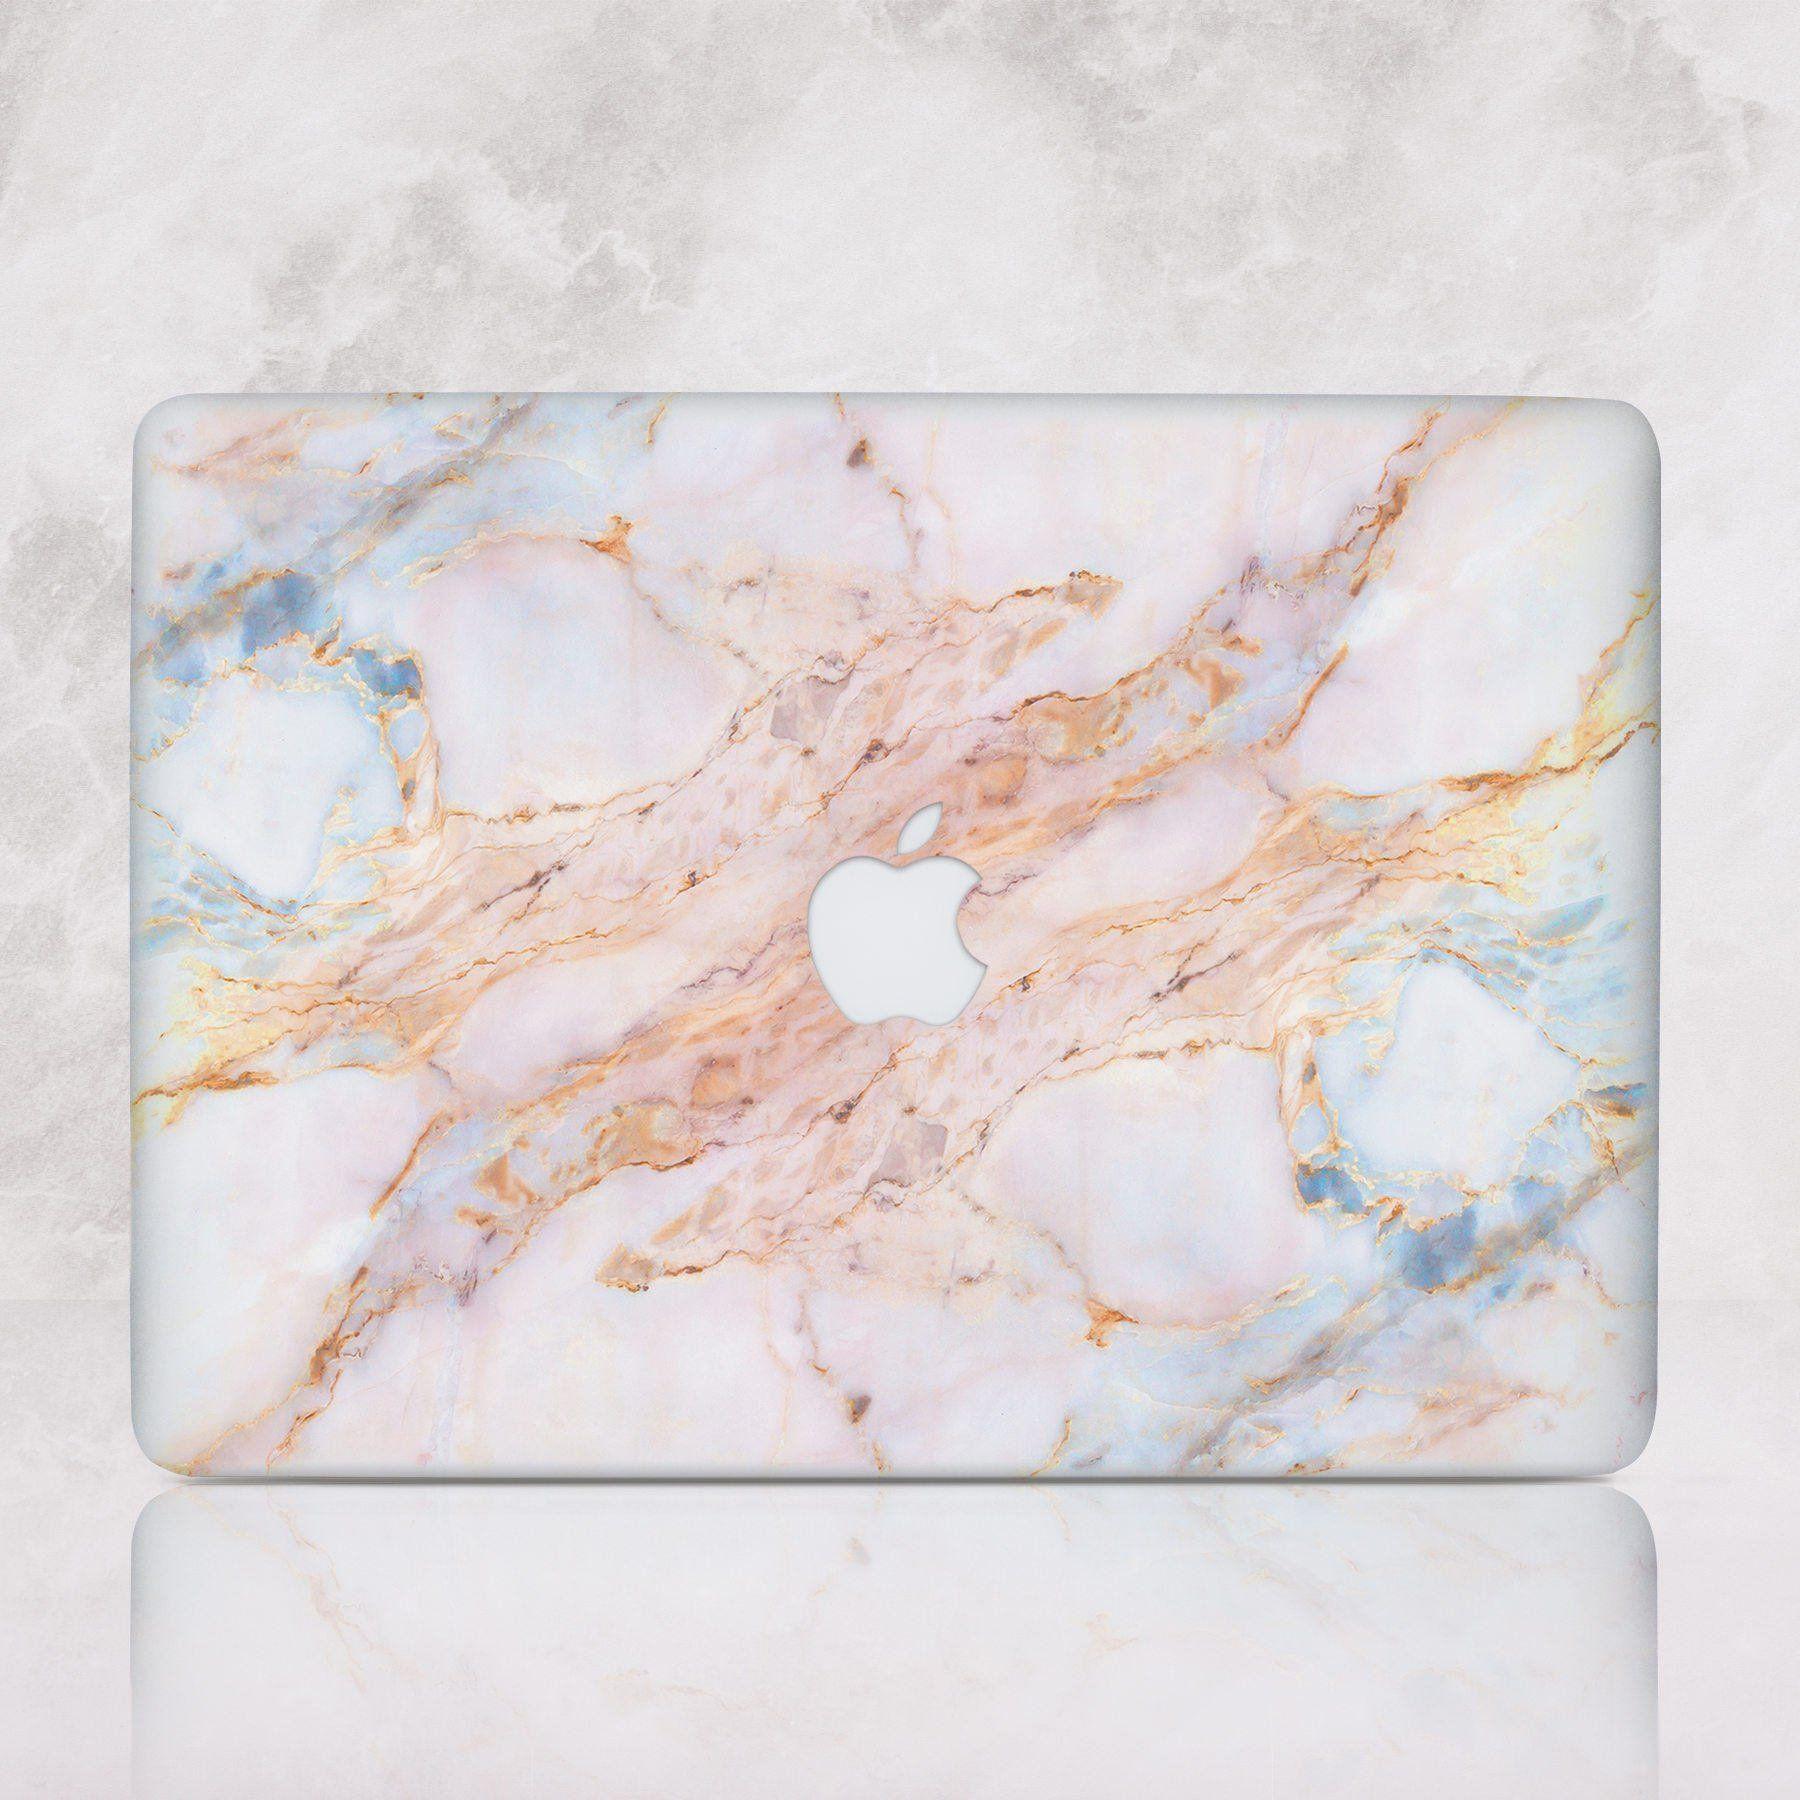 Stone Marble Macbook Pro 13 Hard Case Pro Retina 15 Case